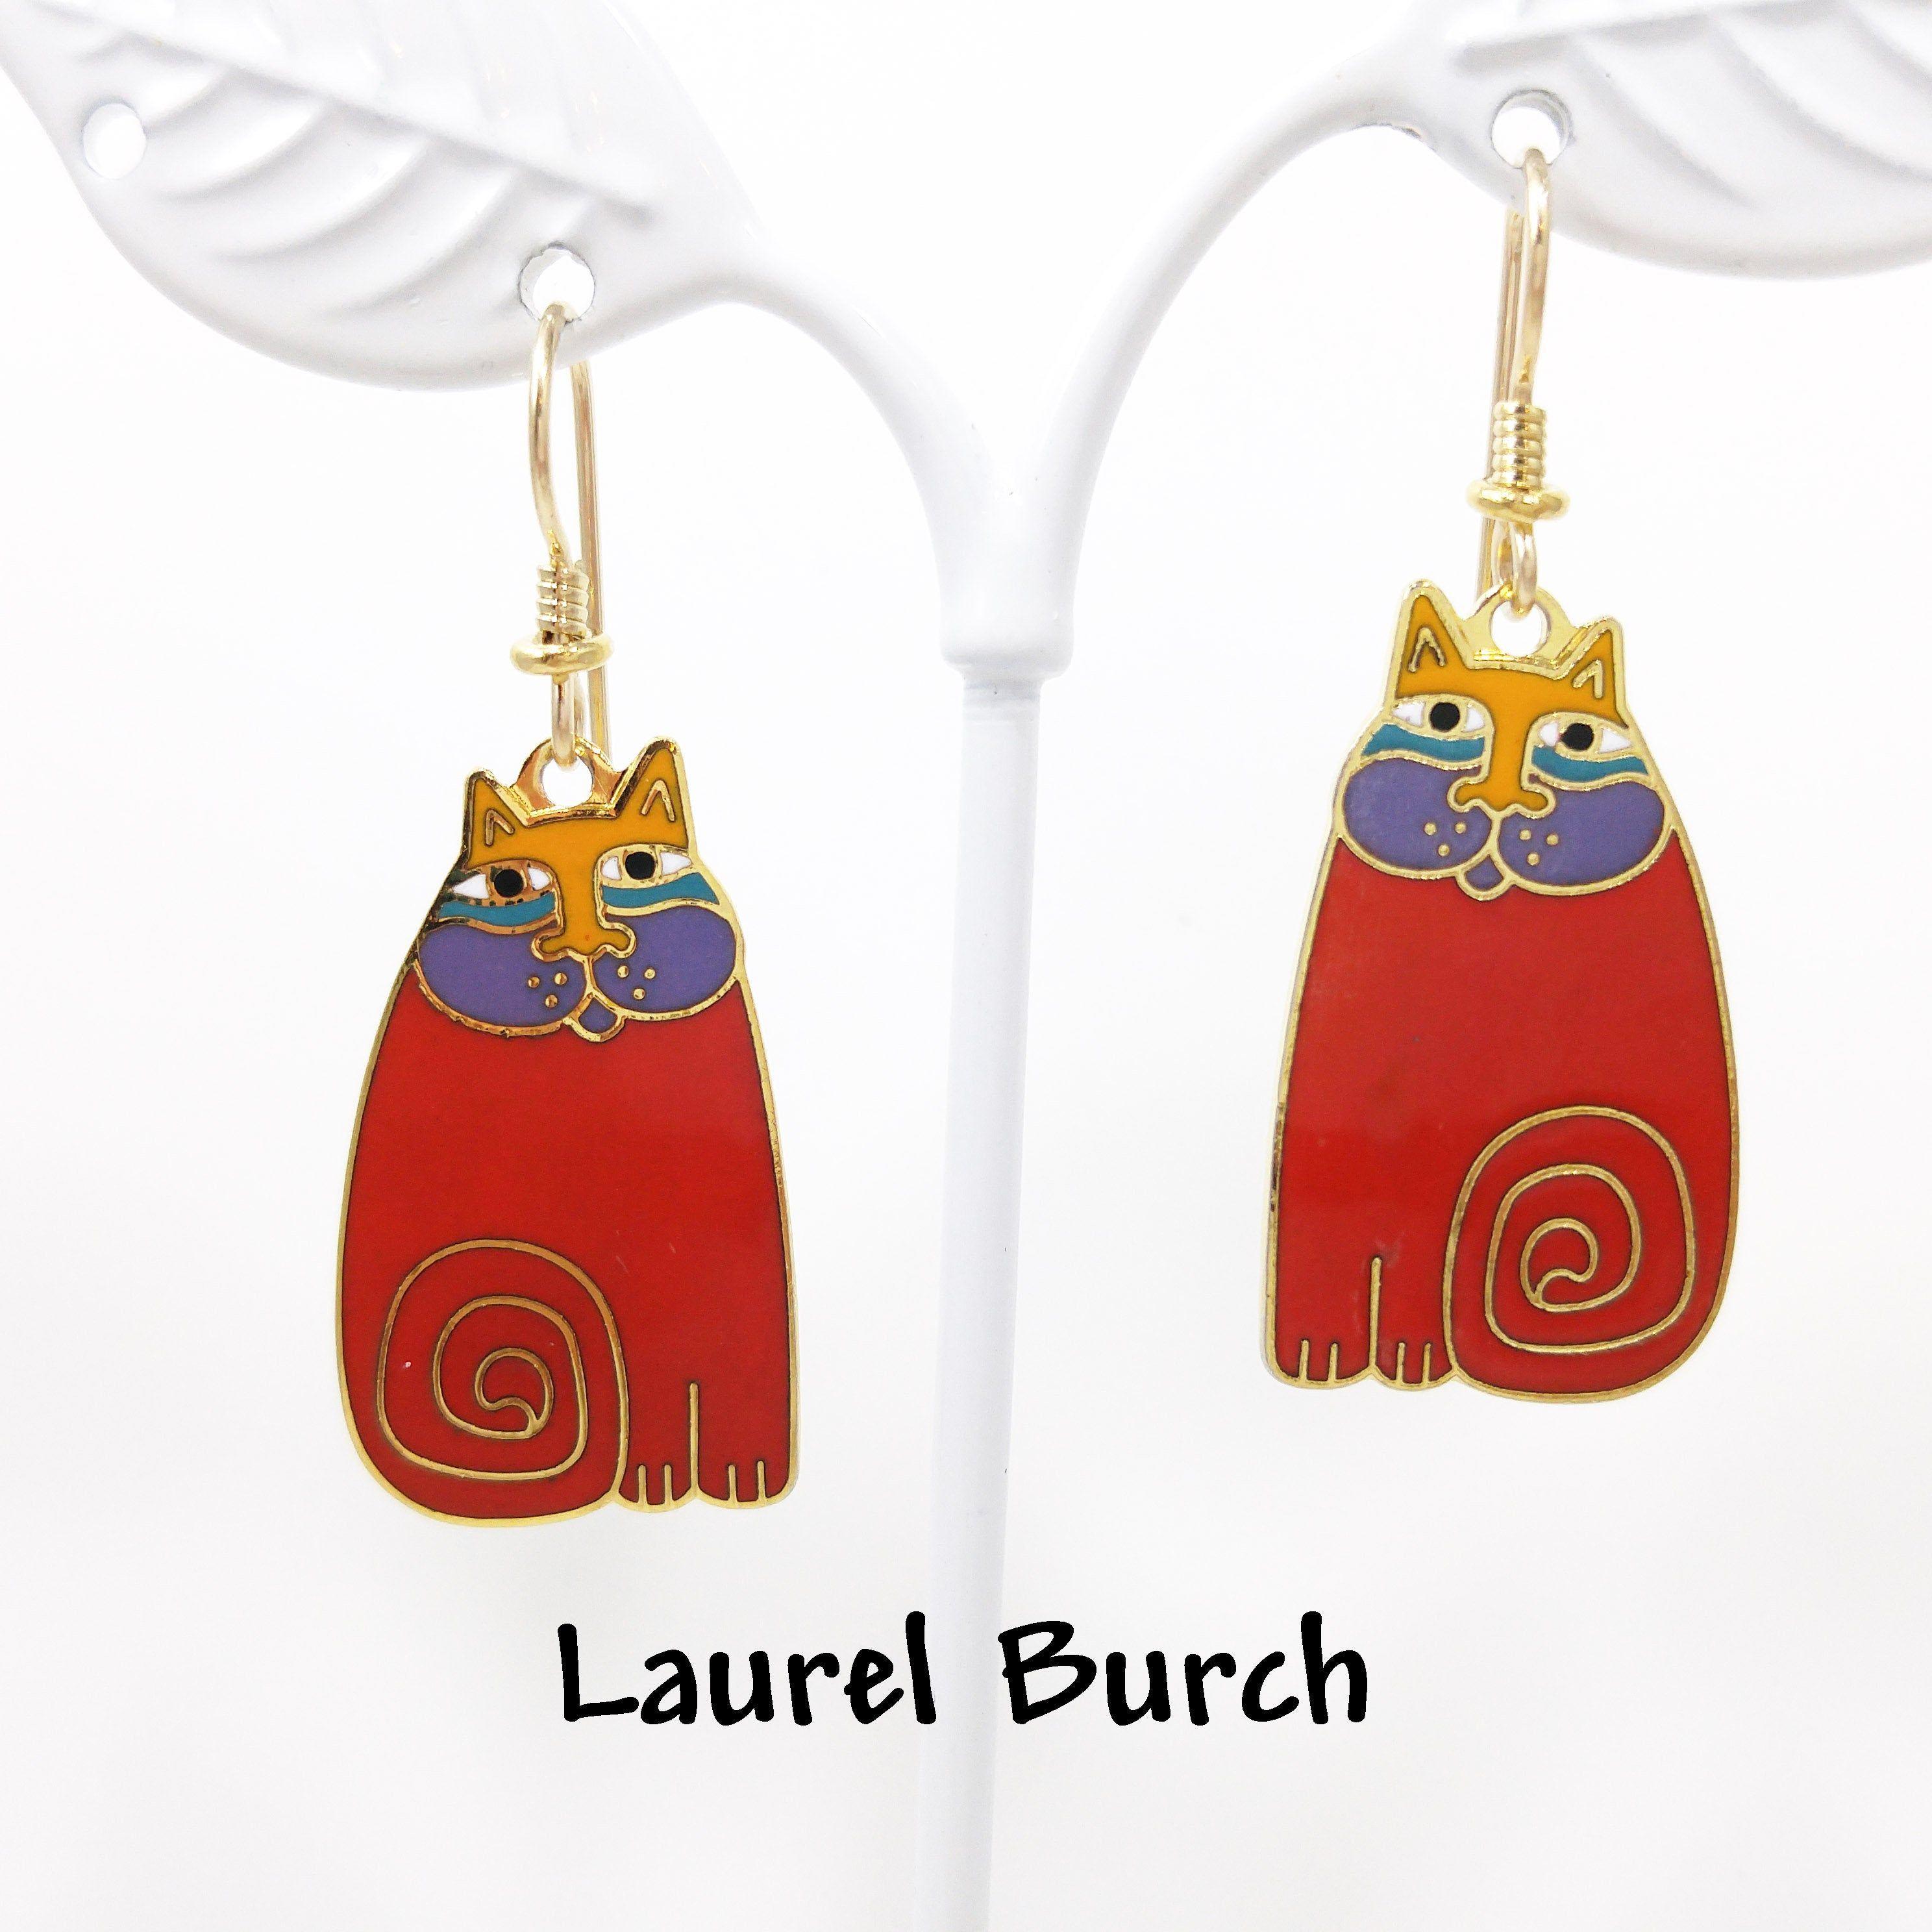 Vintage Earrings,Laurel Burch Ivory Enamel Drop Earrings